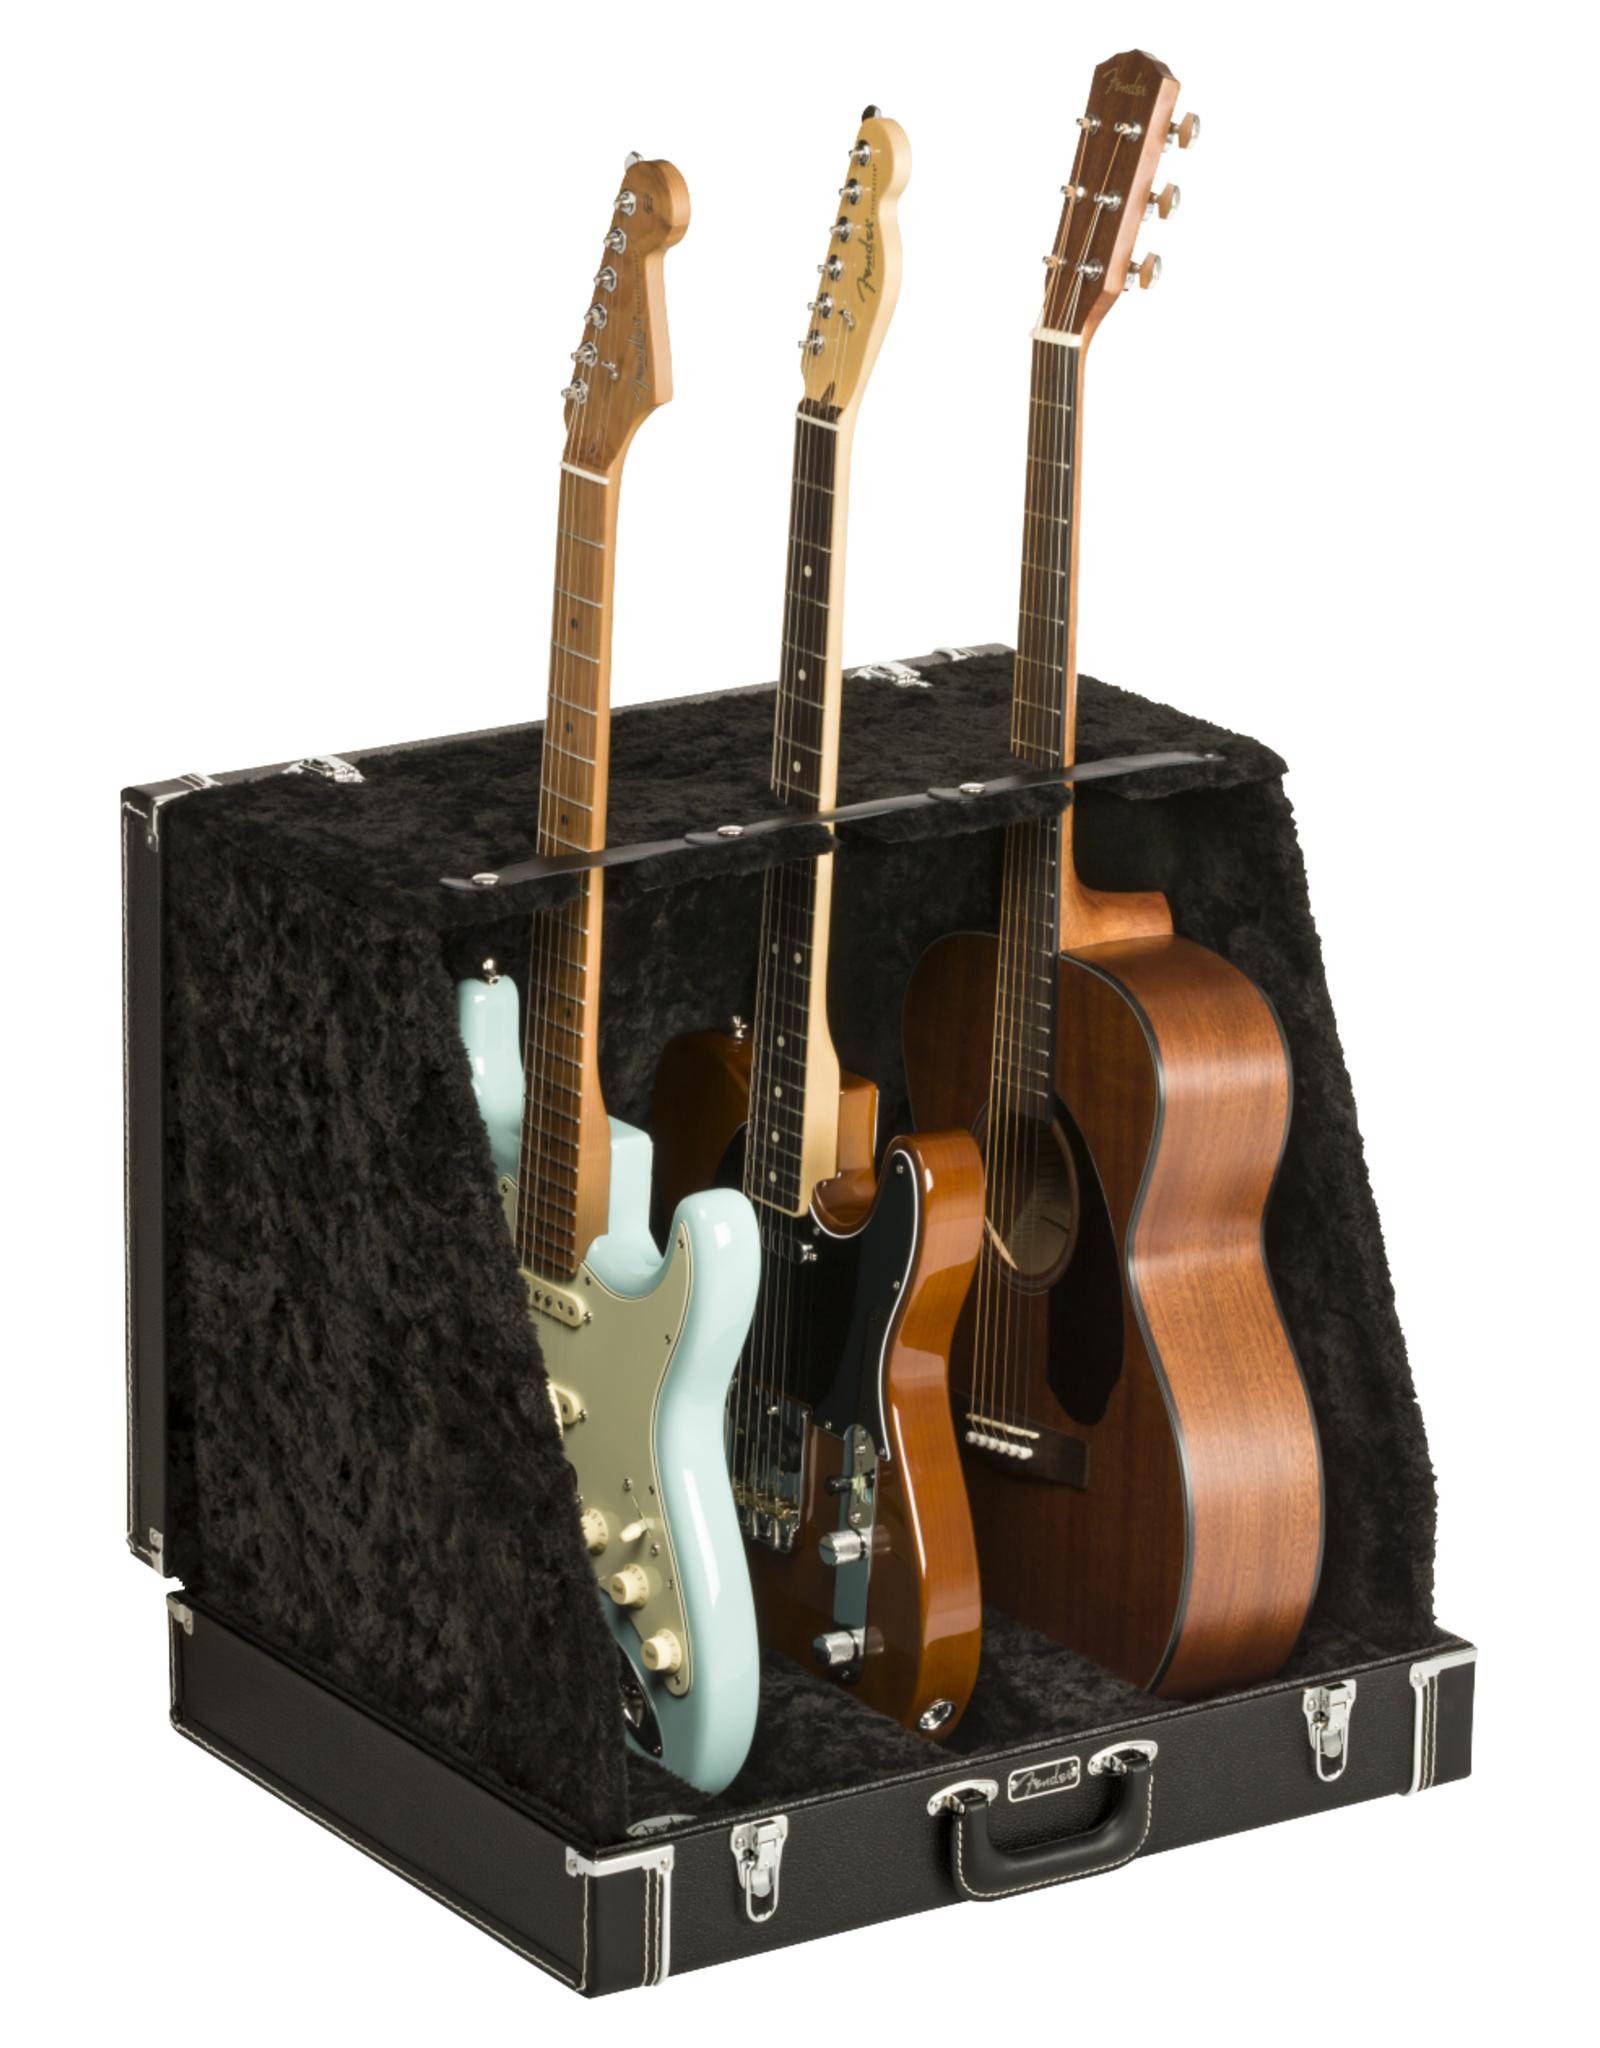 Fender Fender Classic Series Case Stand, Black, 3 Guitar